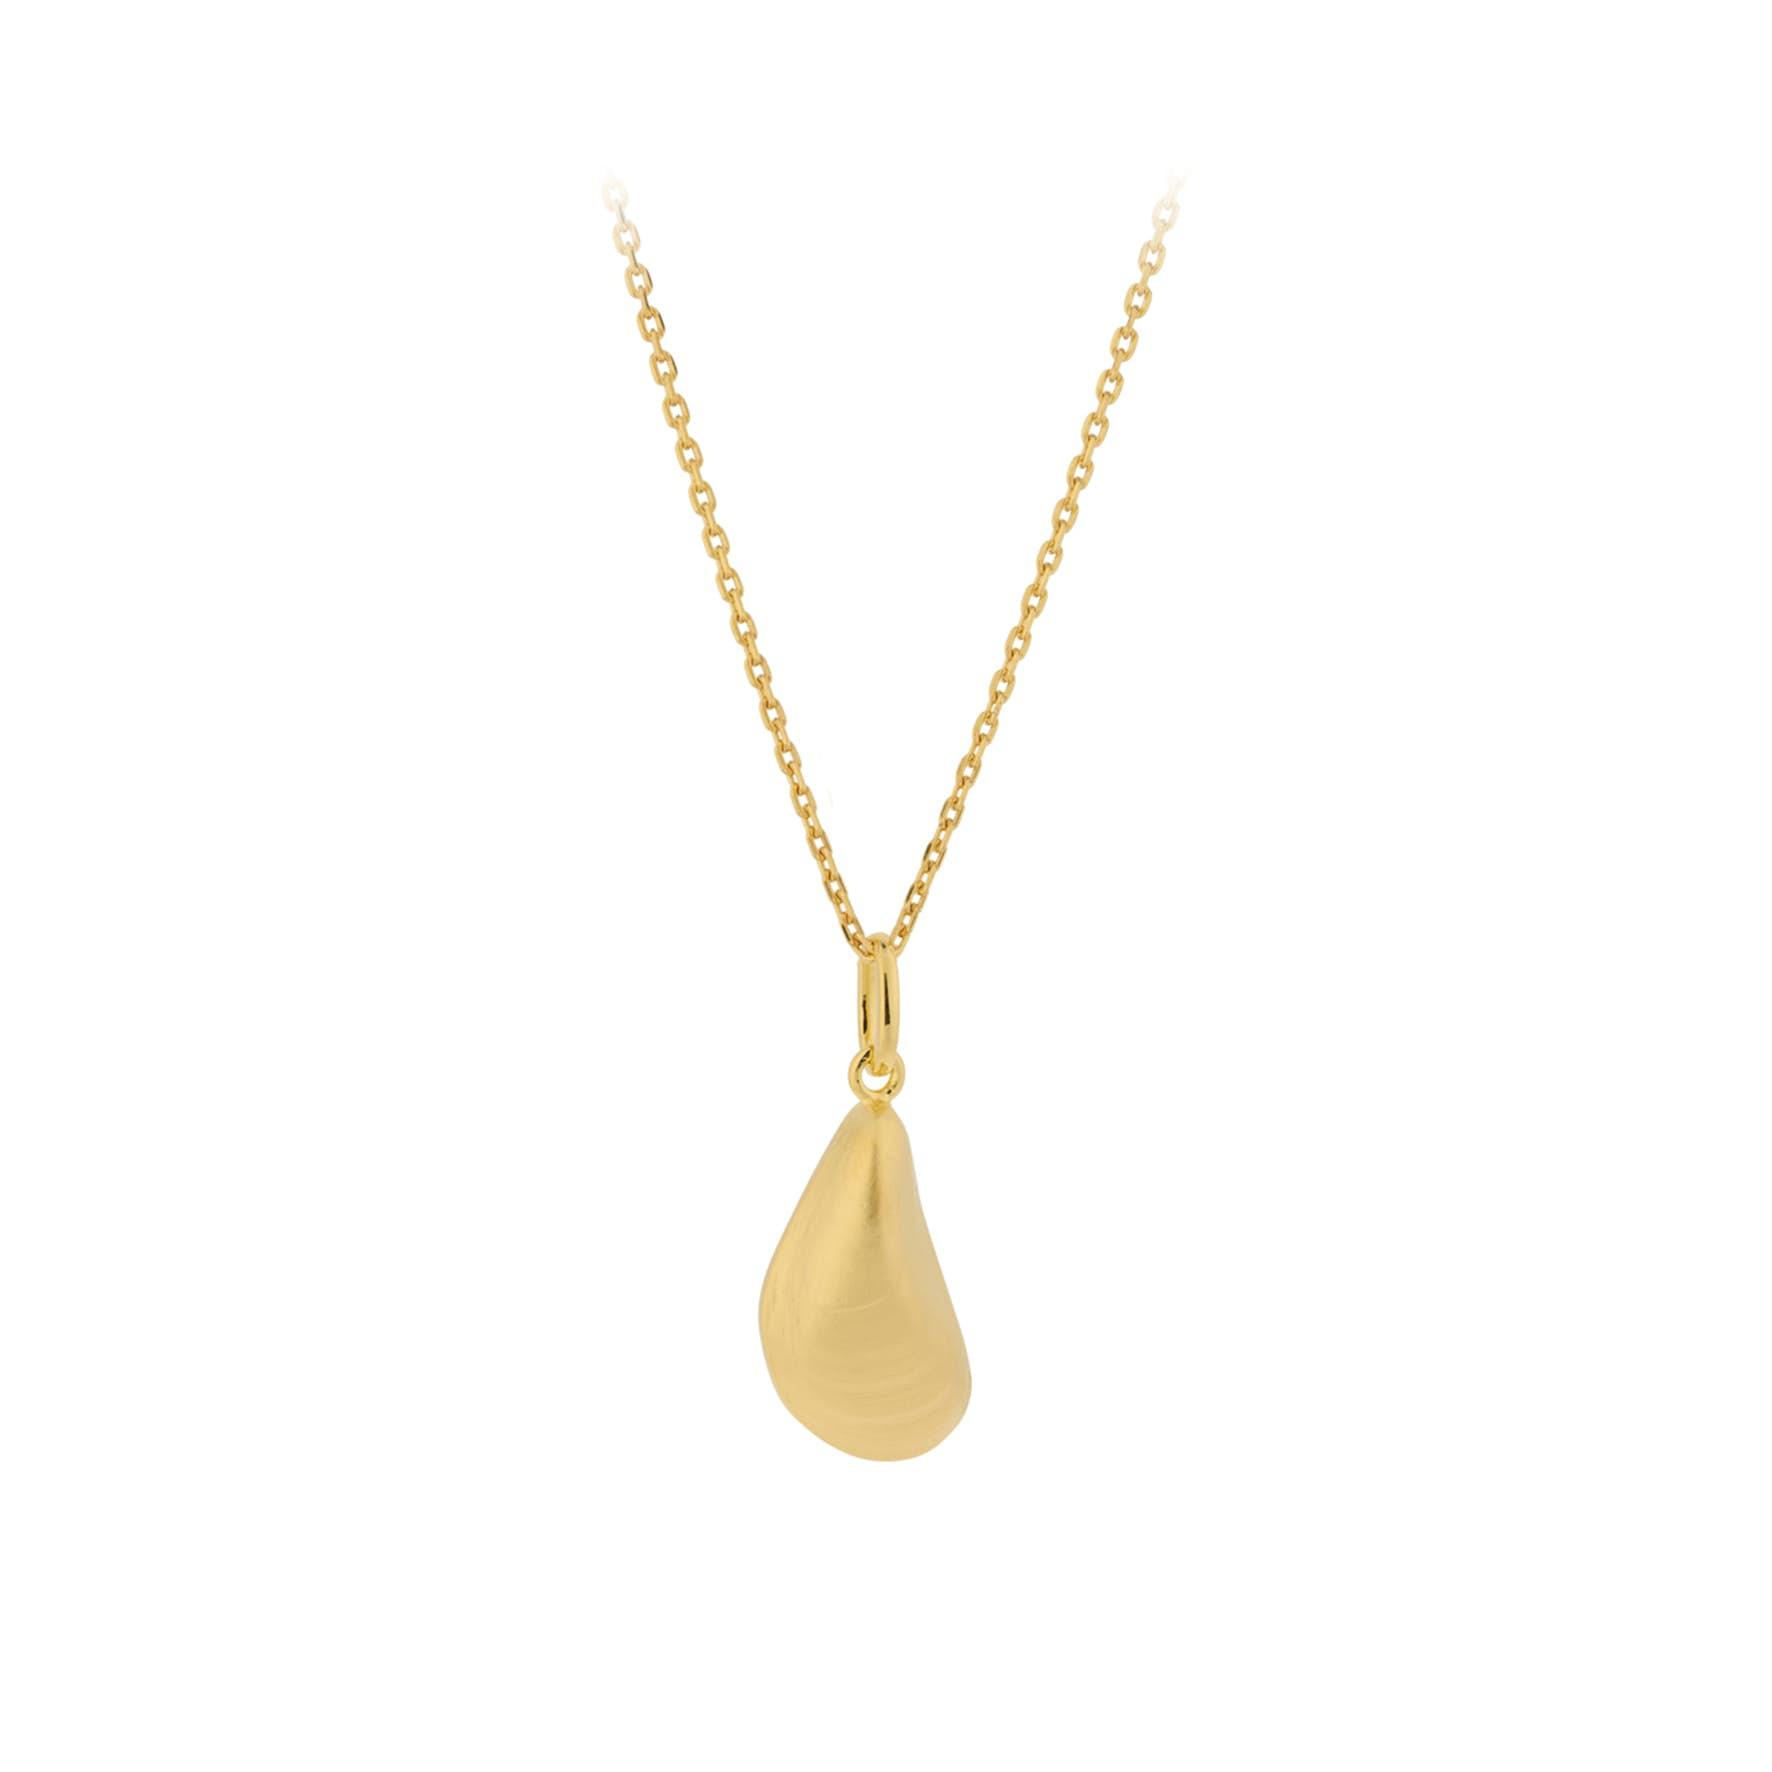 Seashell Necklace von Pernille Corydon in Vergoldet-Silber Sterling 925